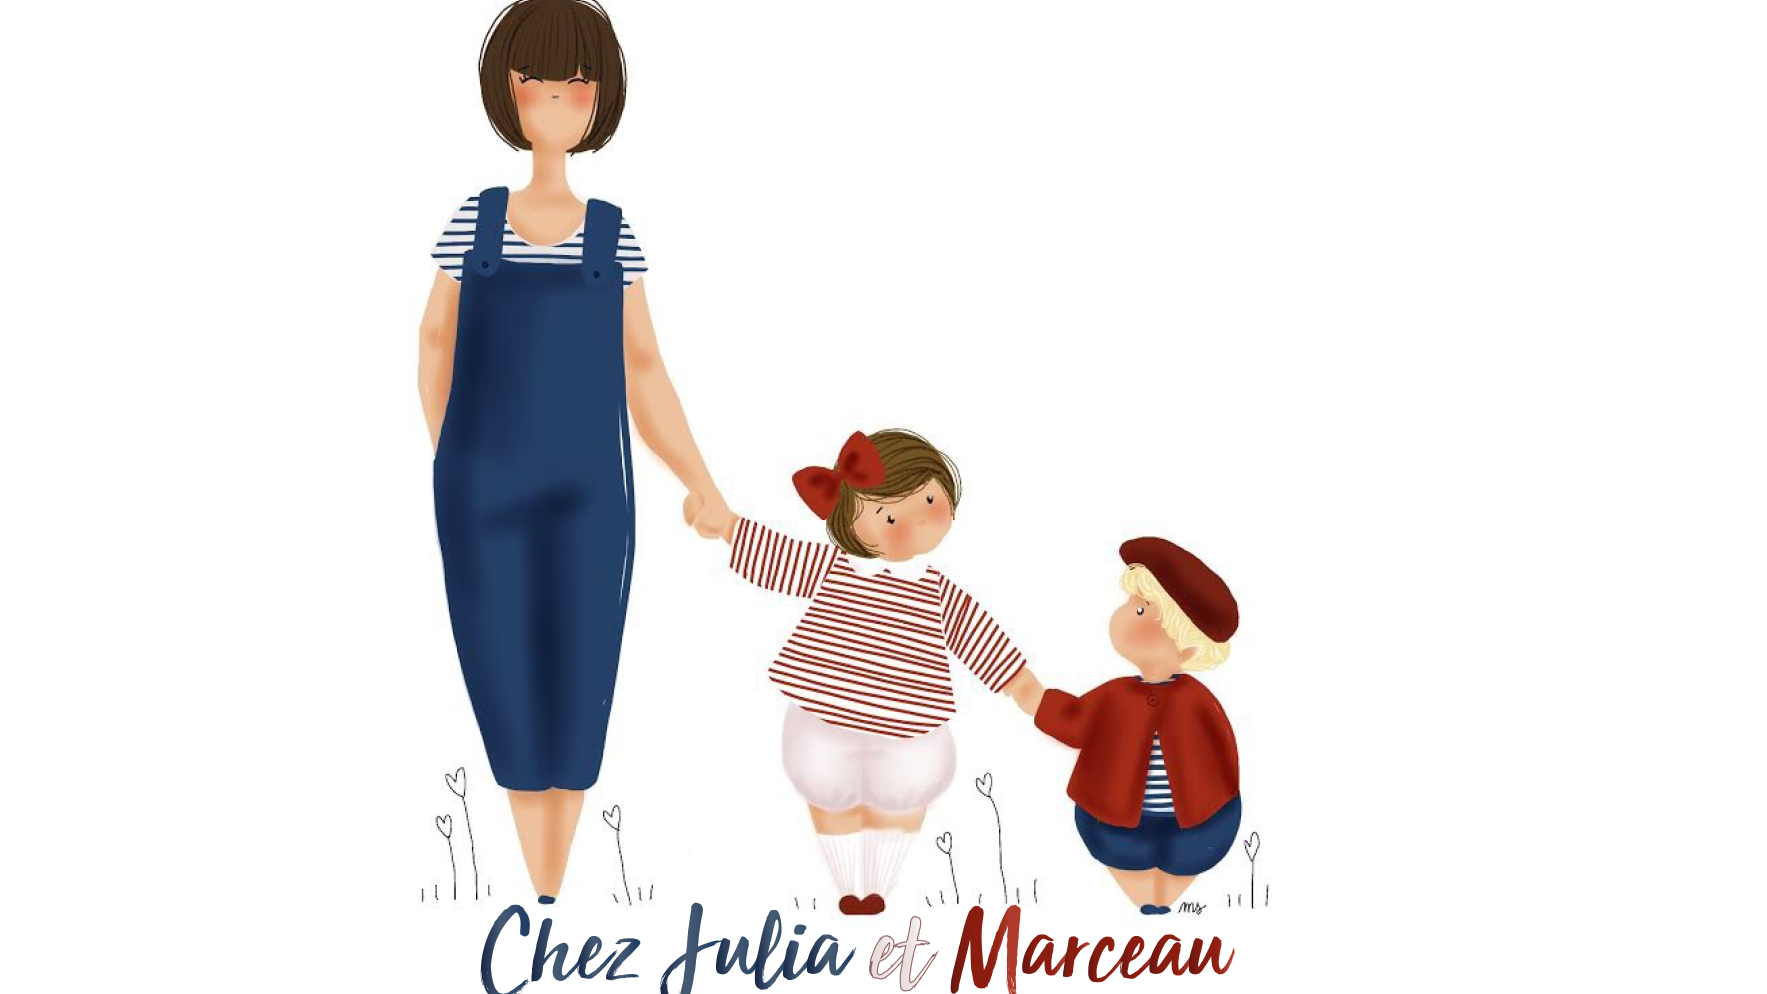 LOGO_-_Chez_Julia_et_Marceau-1523899673.jpg